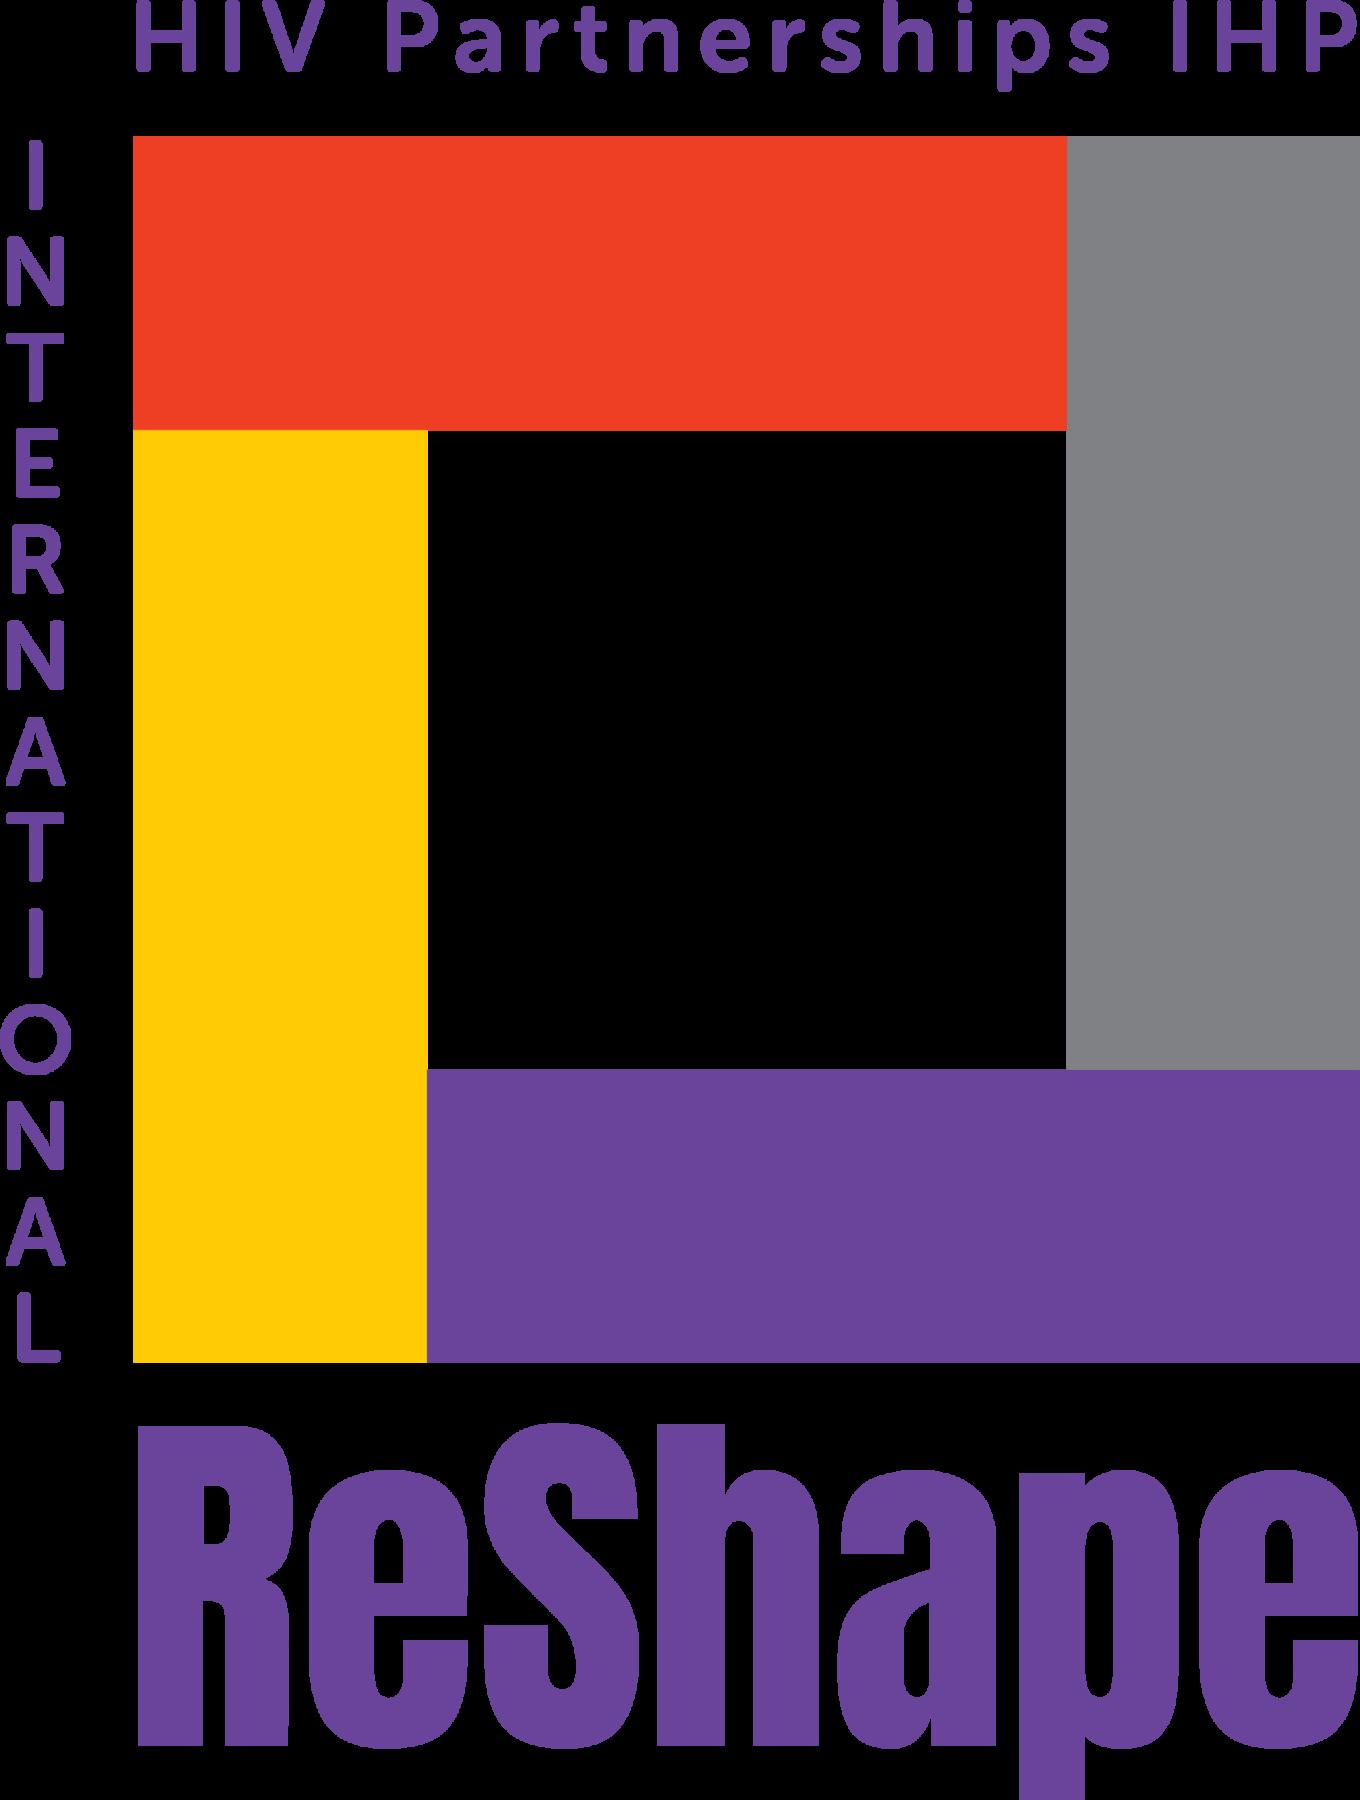 RESHAPE/IHP